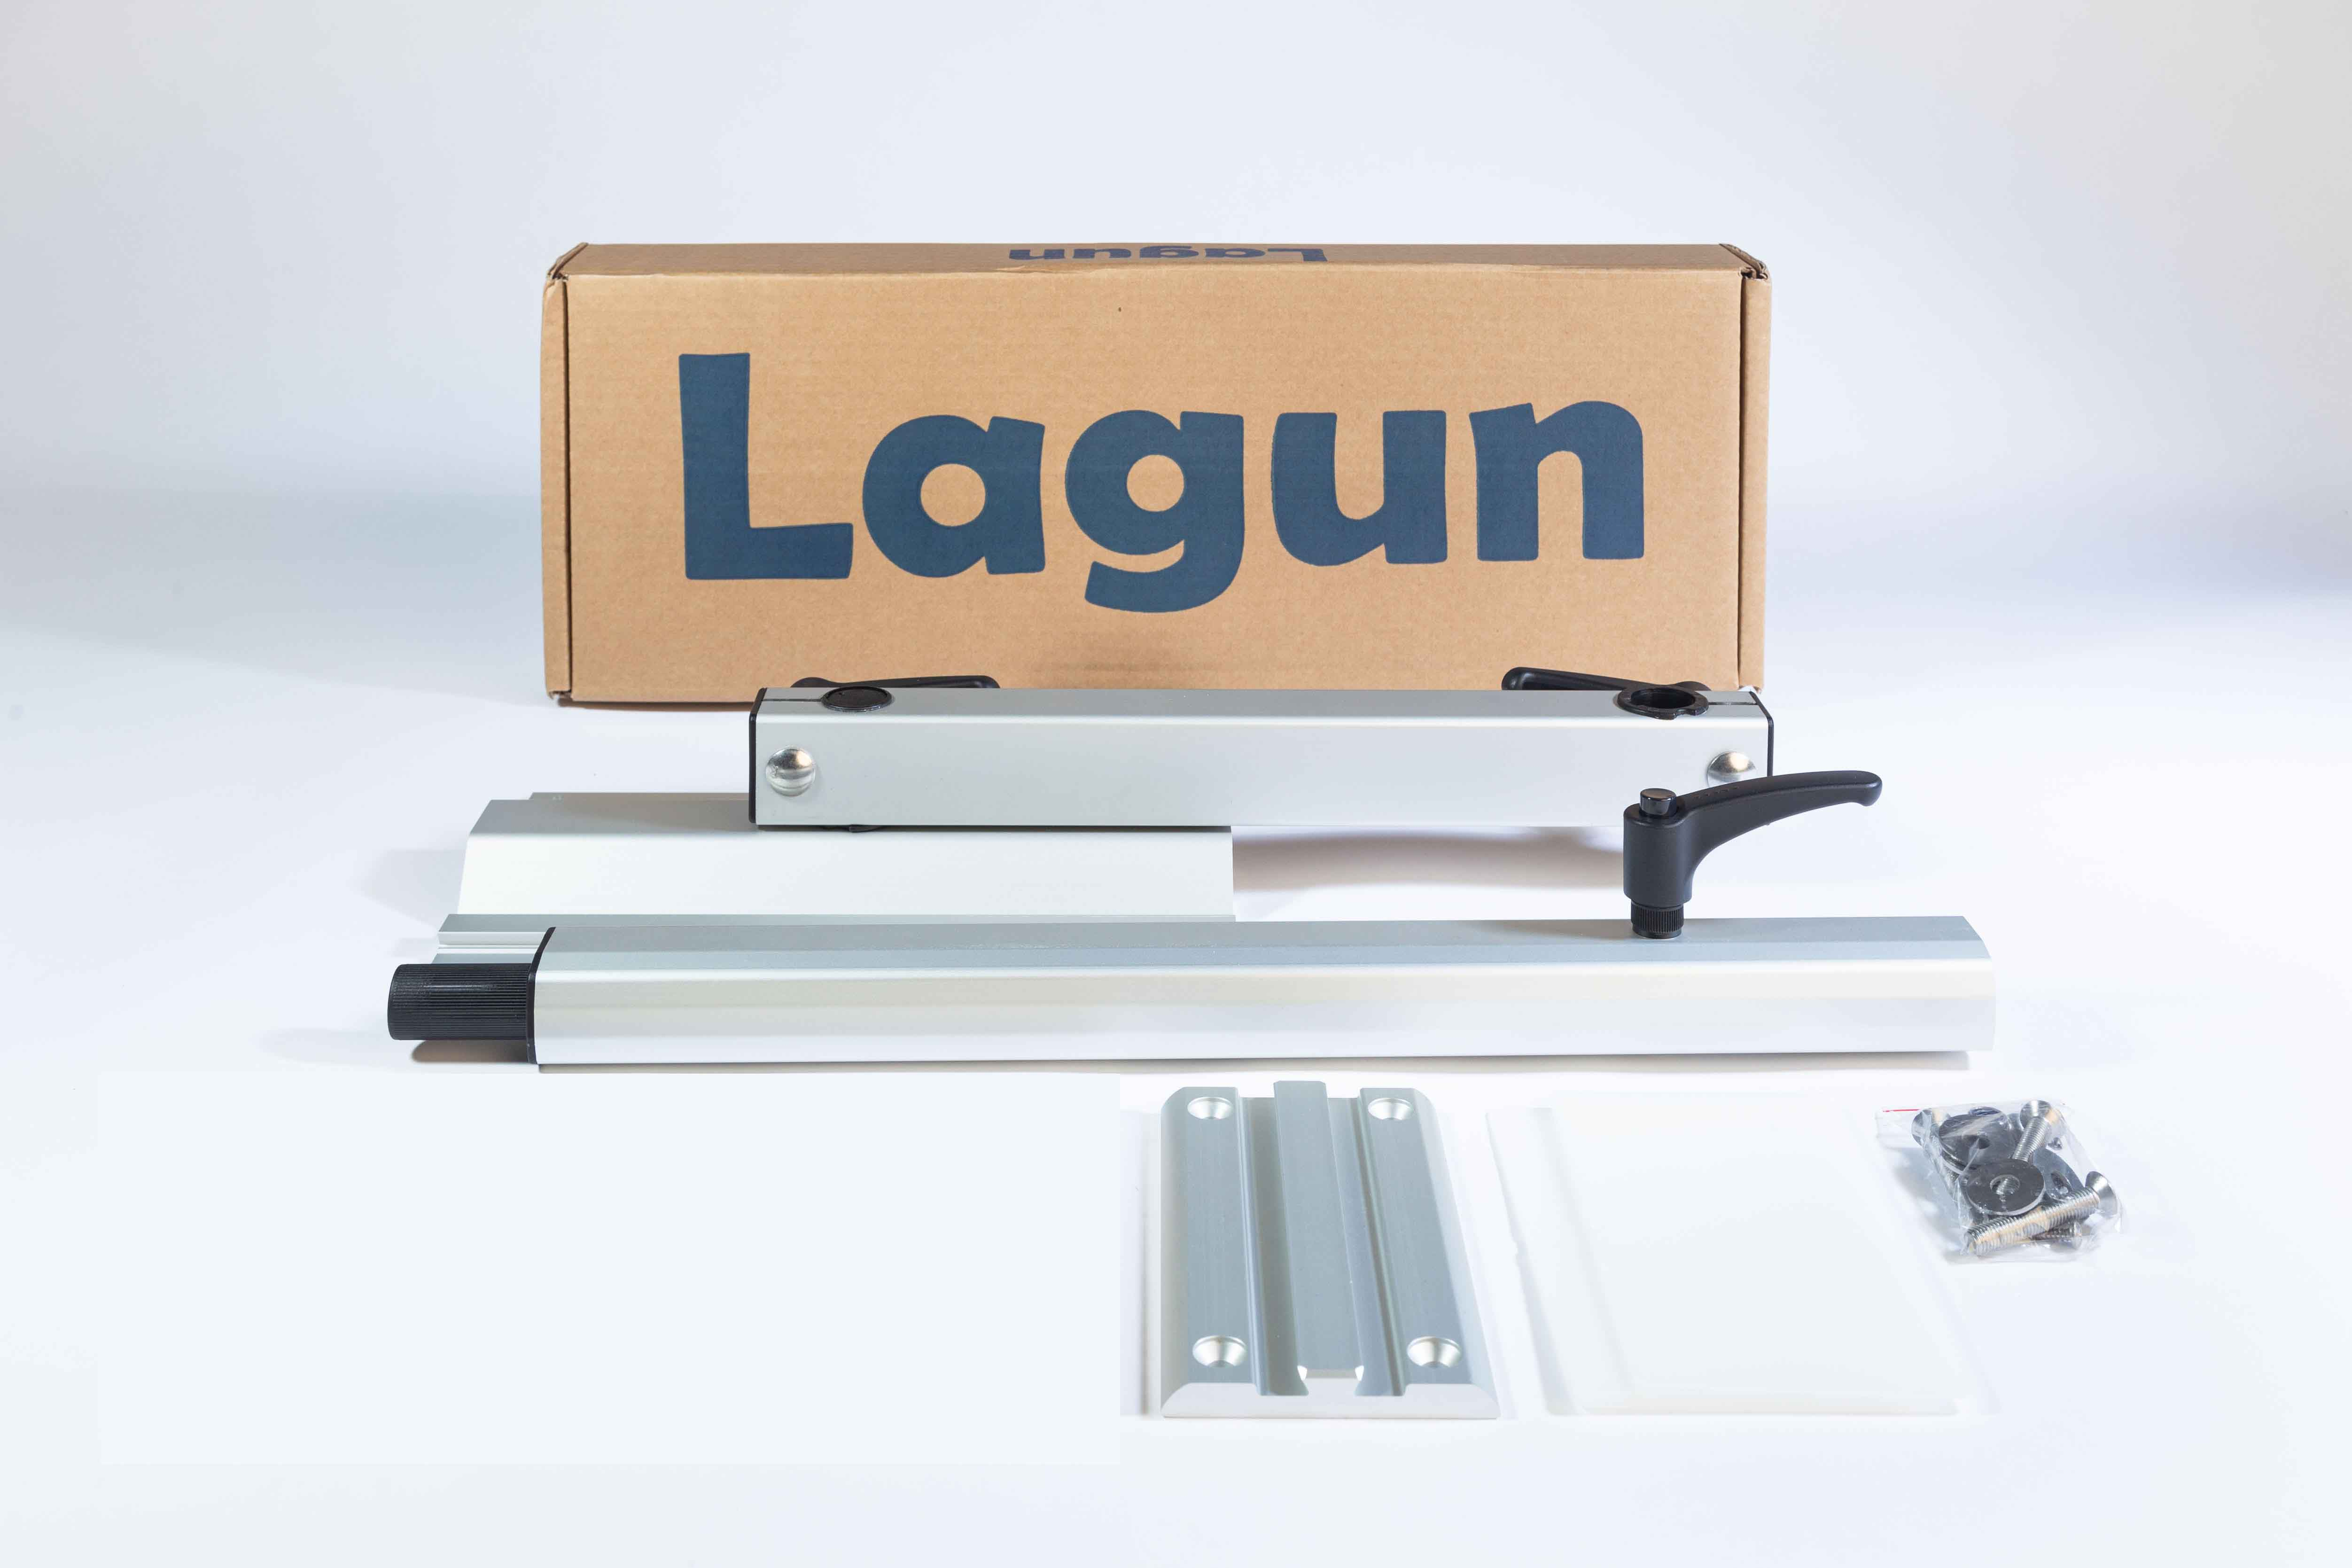 Lagun Tischgestell - flexibler Wohnmobiltisch Bootstisch